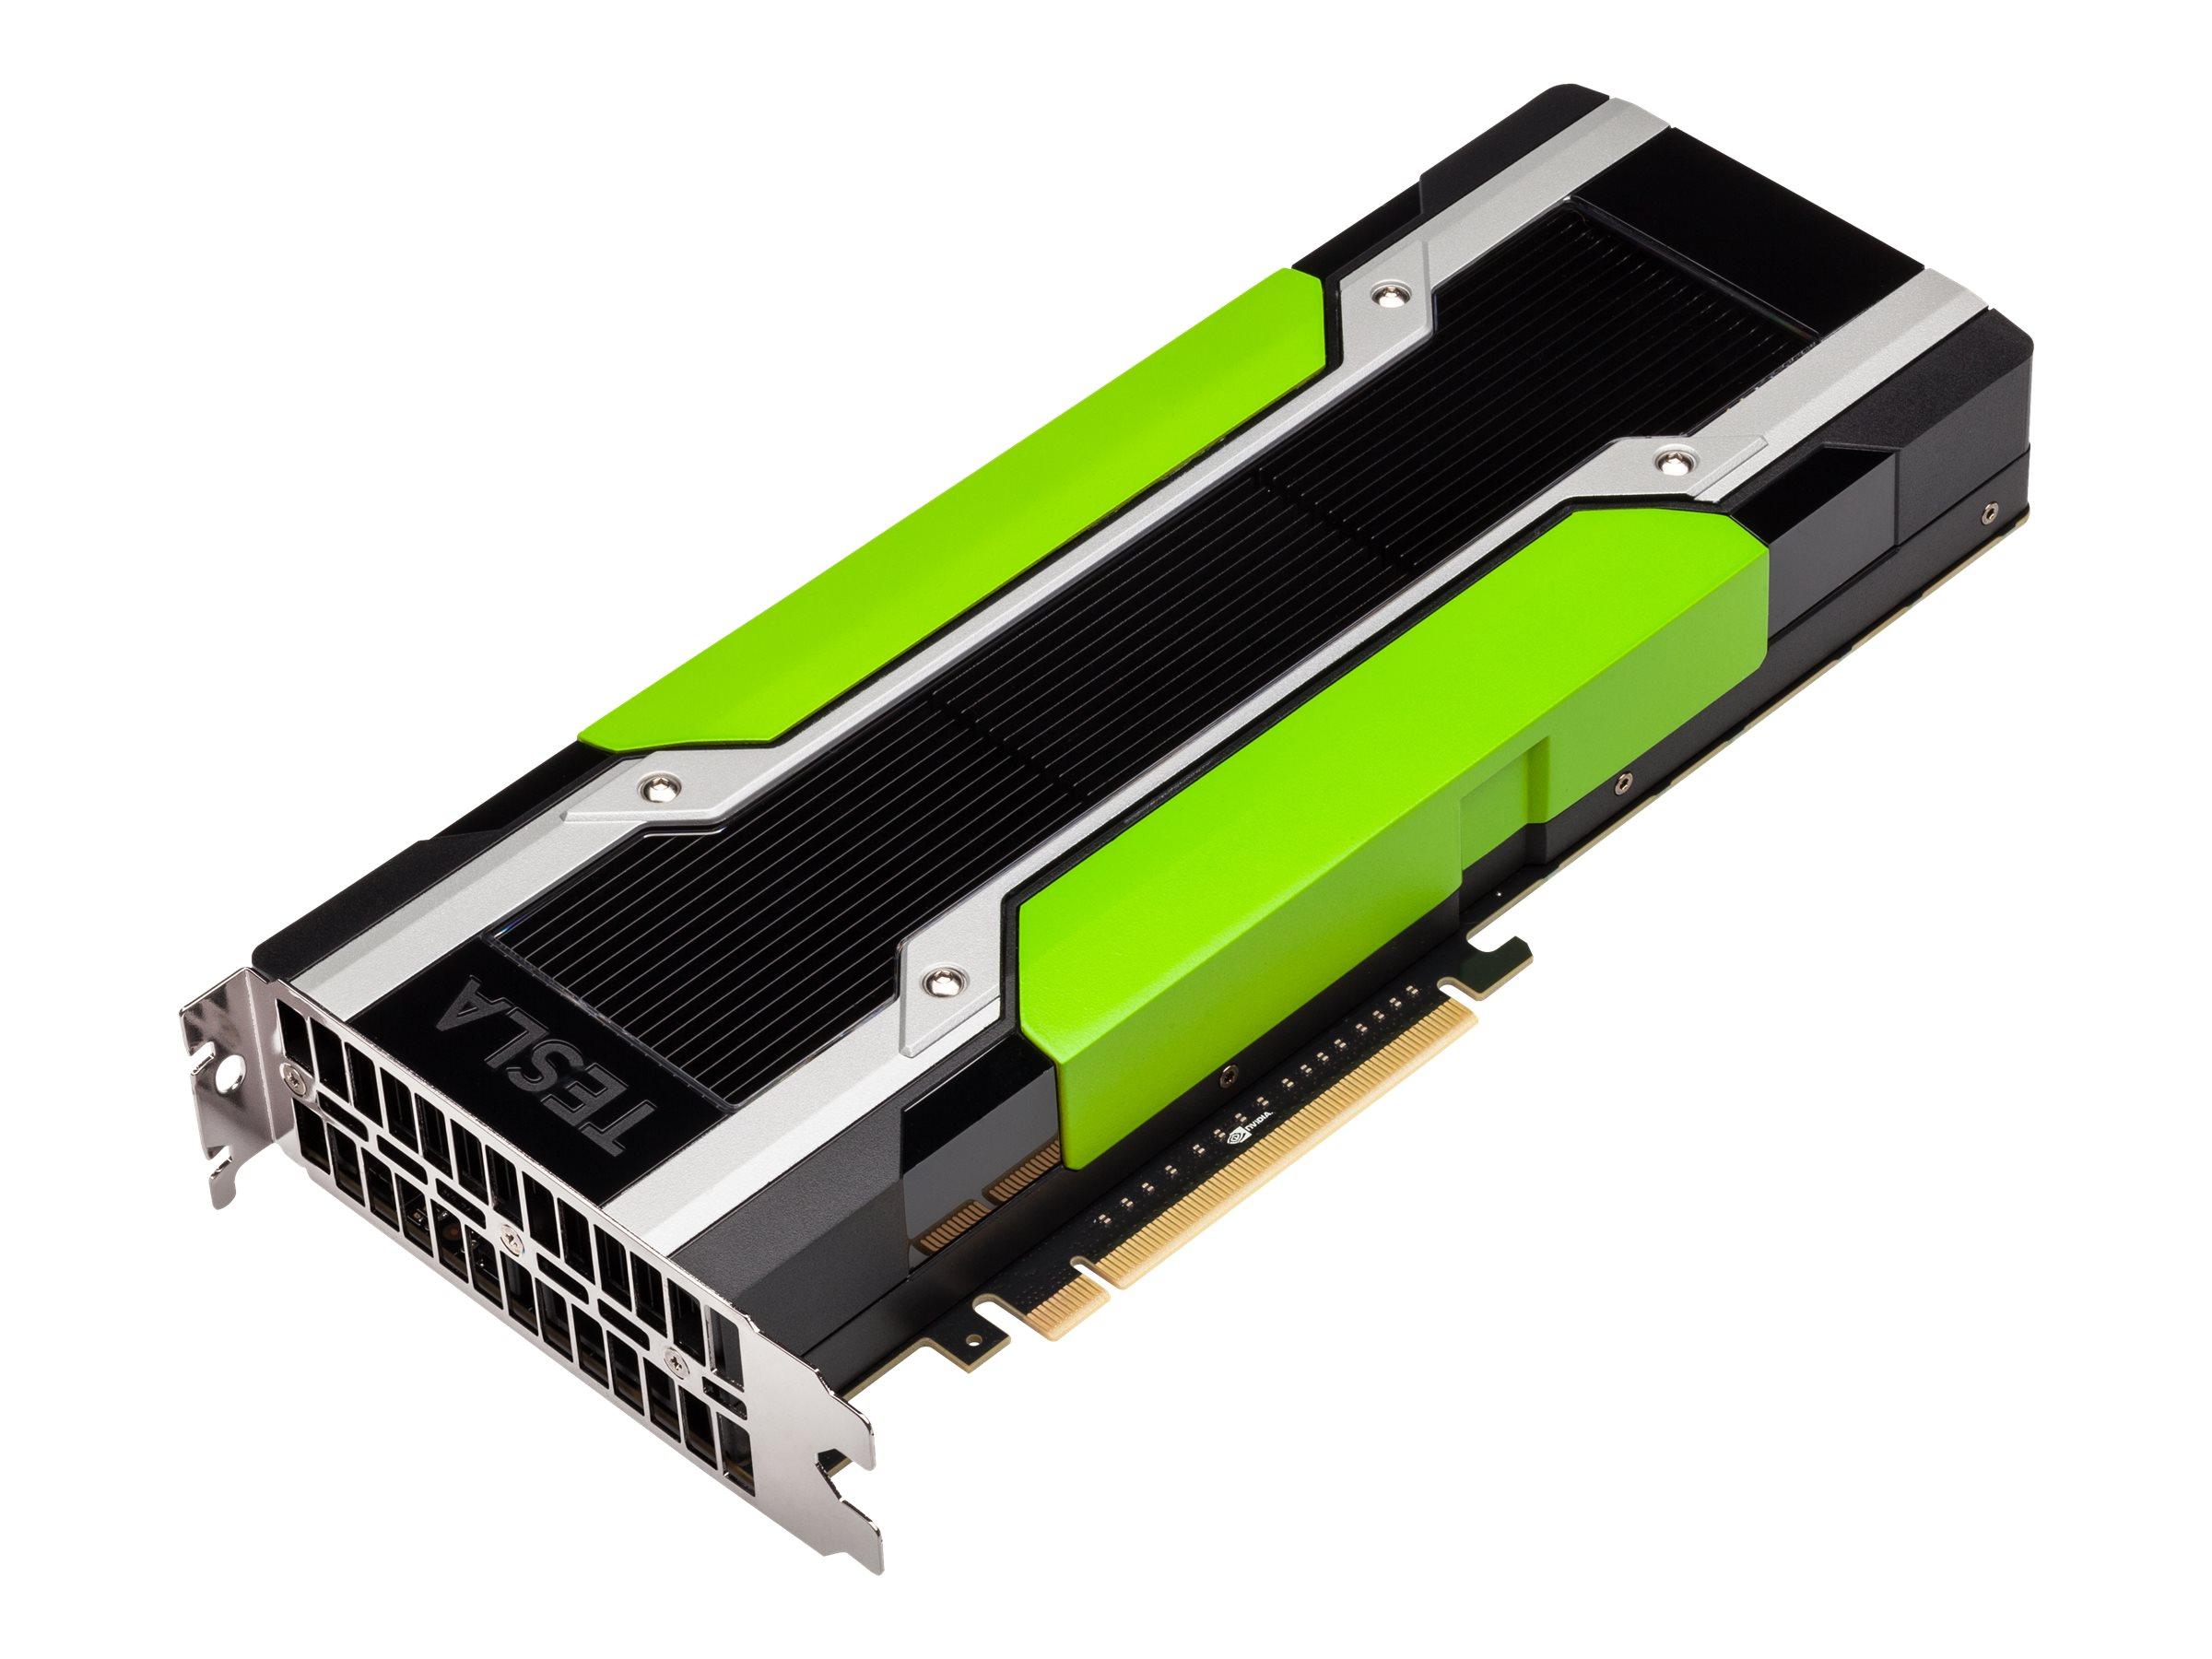 NVIDIA Tesla M4 - GPU-Rechenprozessor - Tesla M4 - 4 GB GDDR5 - PCIe 3.0 x16 - ohne Lüfter